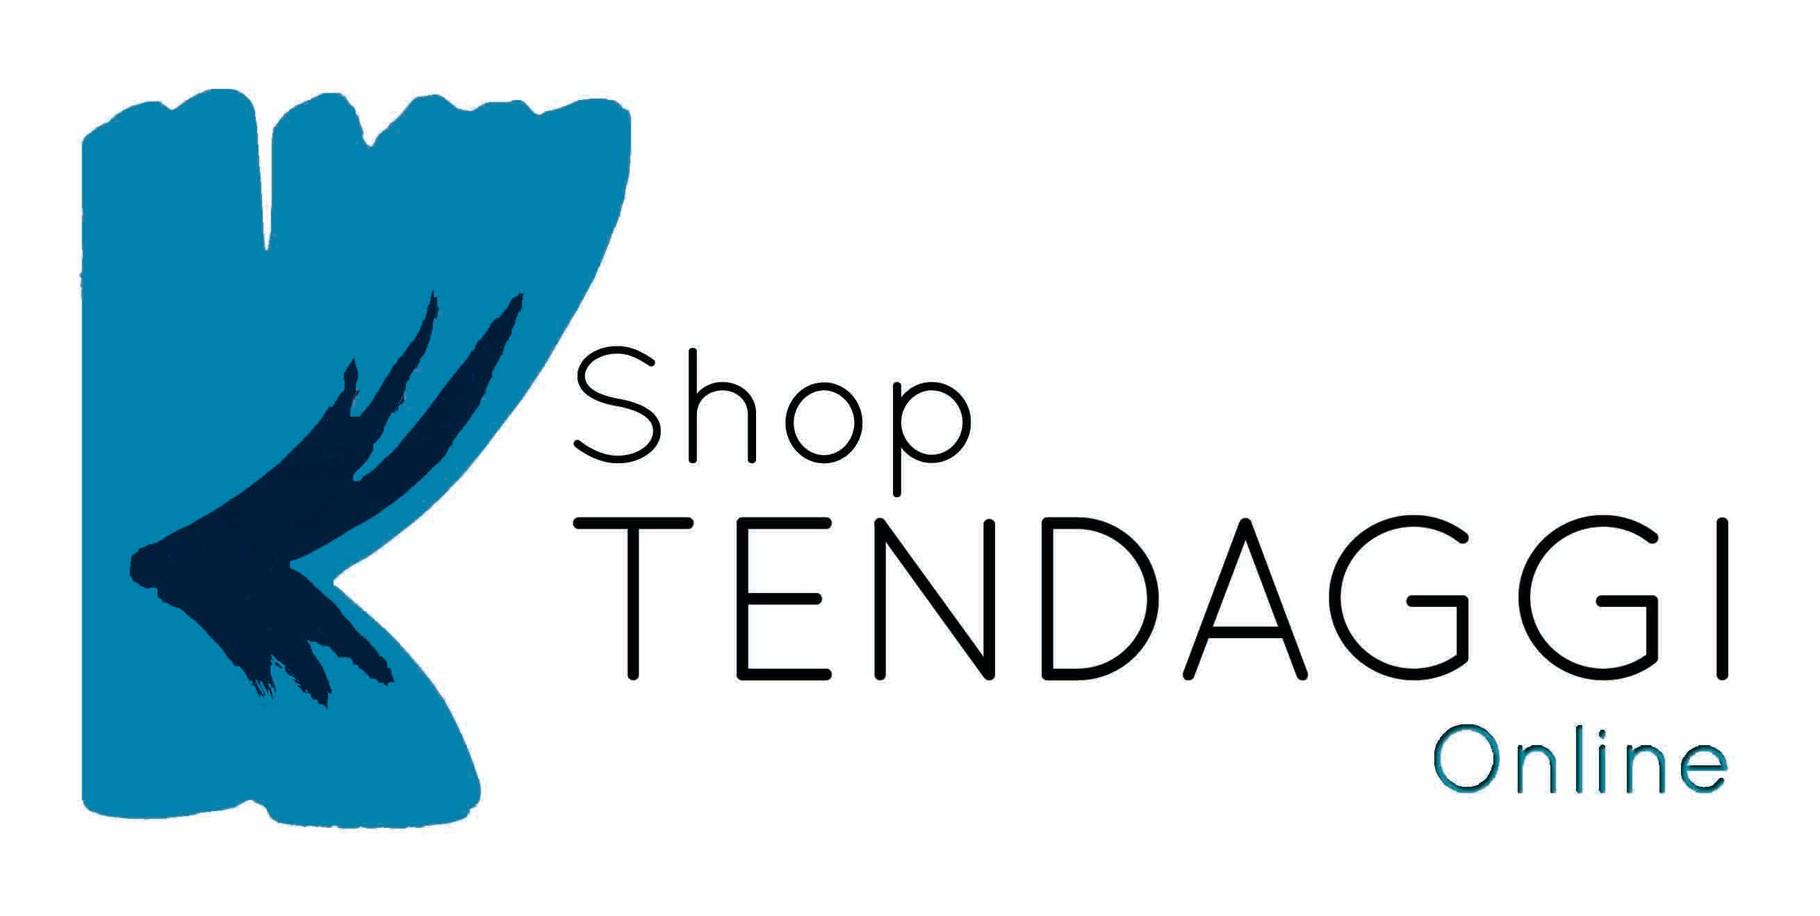 Vendita tende interni on line tende e tessuti duarredo with vendita tende interni on line p - Tende per interni on line ...